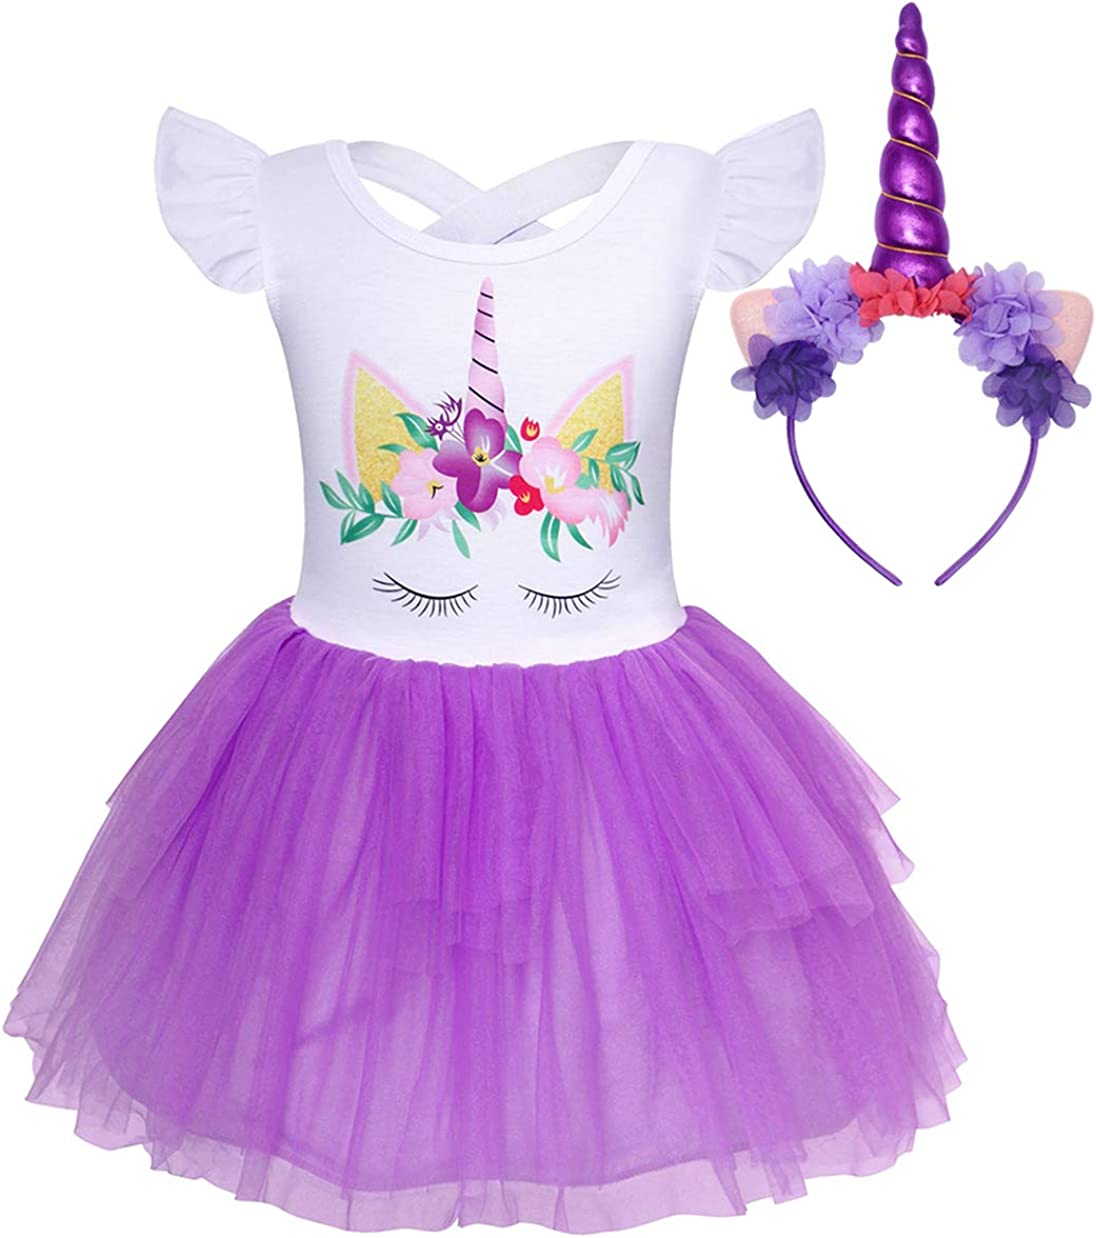 Jurebecia Girls Unicorn Costume Dress Pageant Party Wedding Dress Kids Ball Gown Halloween Tutu Dress with Headband